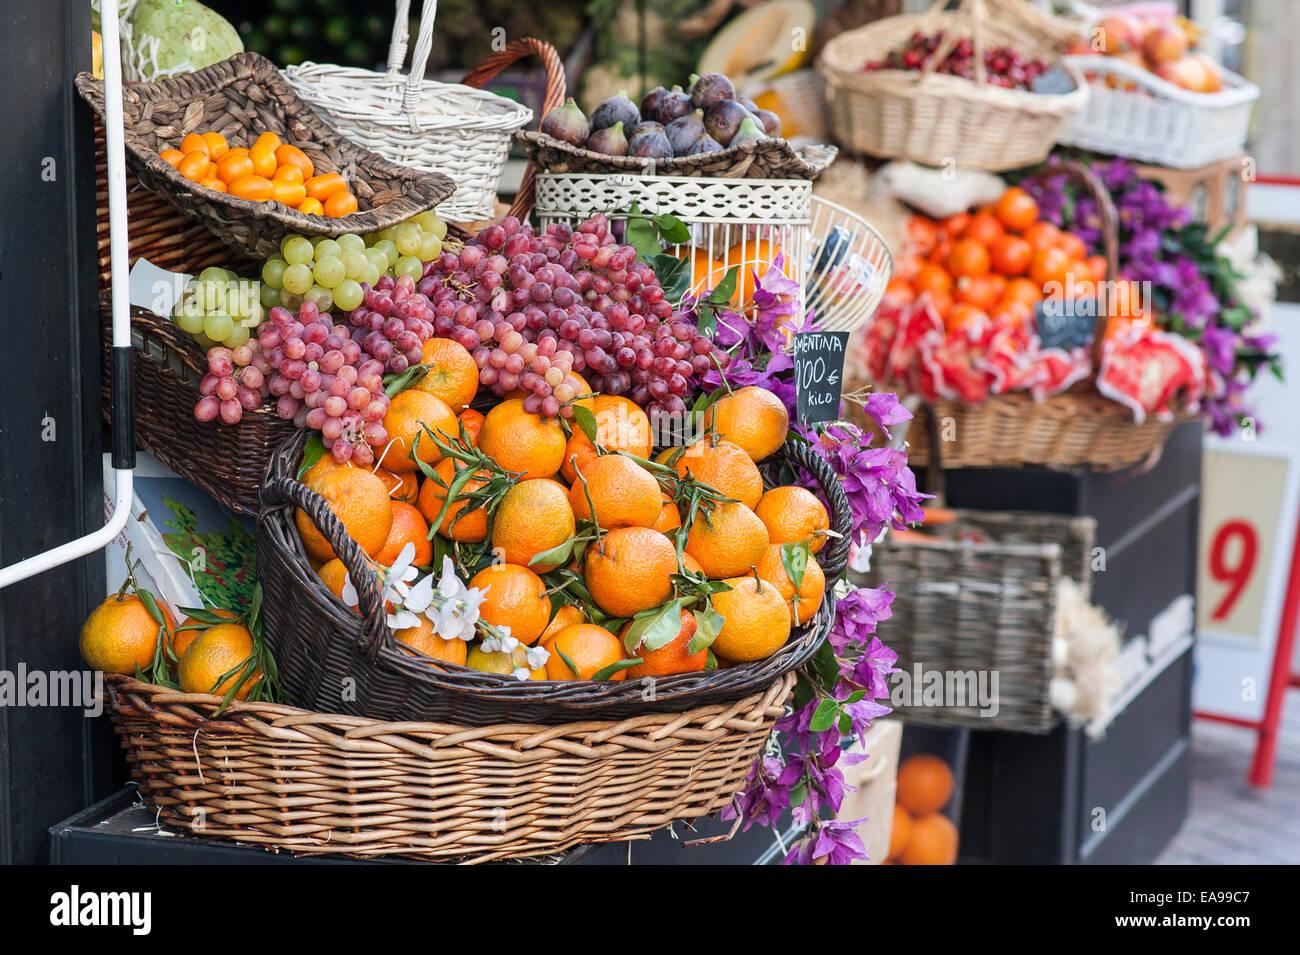 Palma de Mallorca, fruits,obst,orange,Weintraube,grapes, Stock Photo